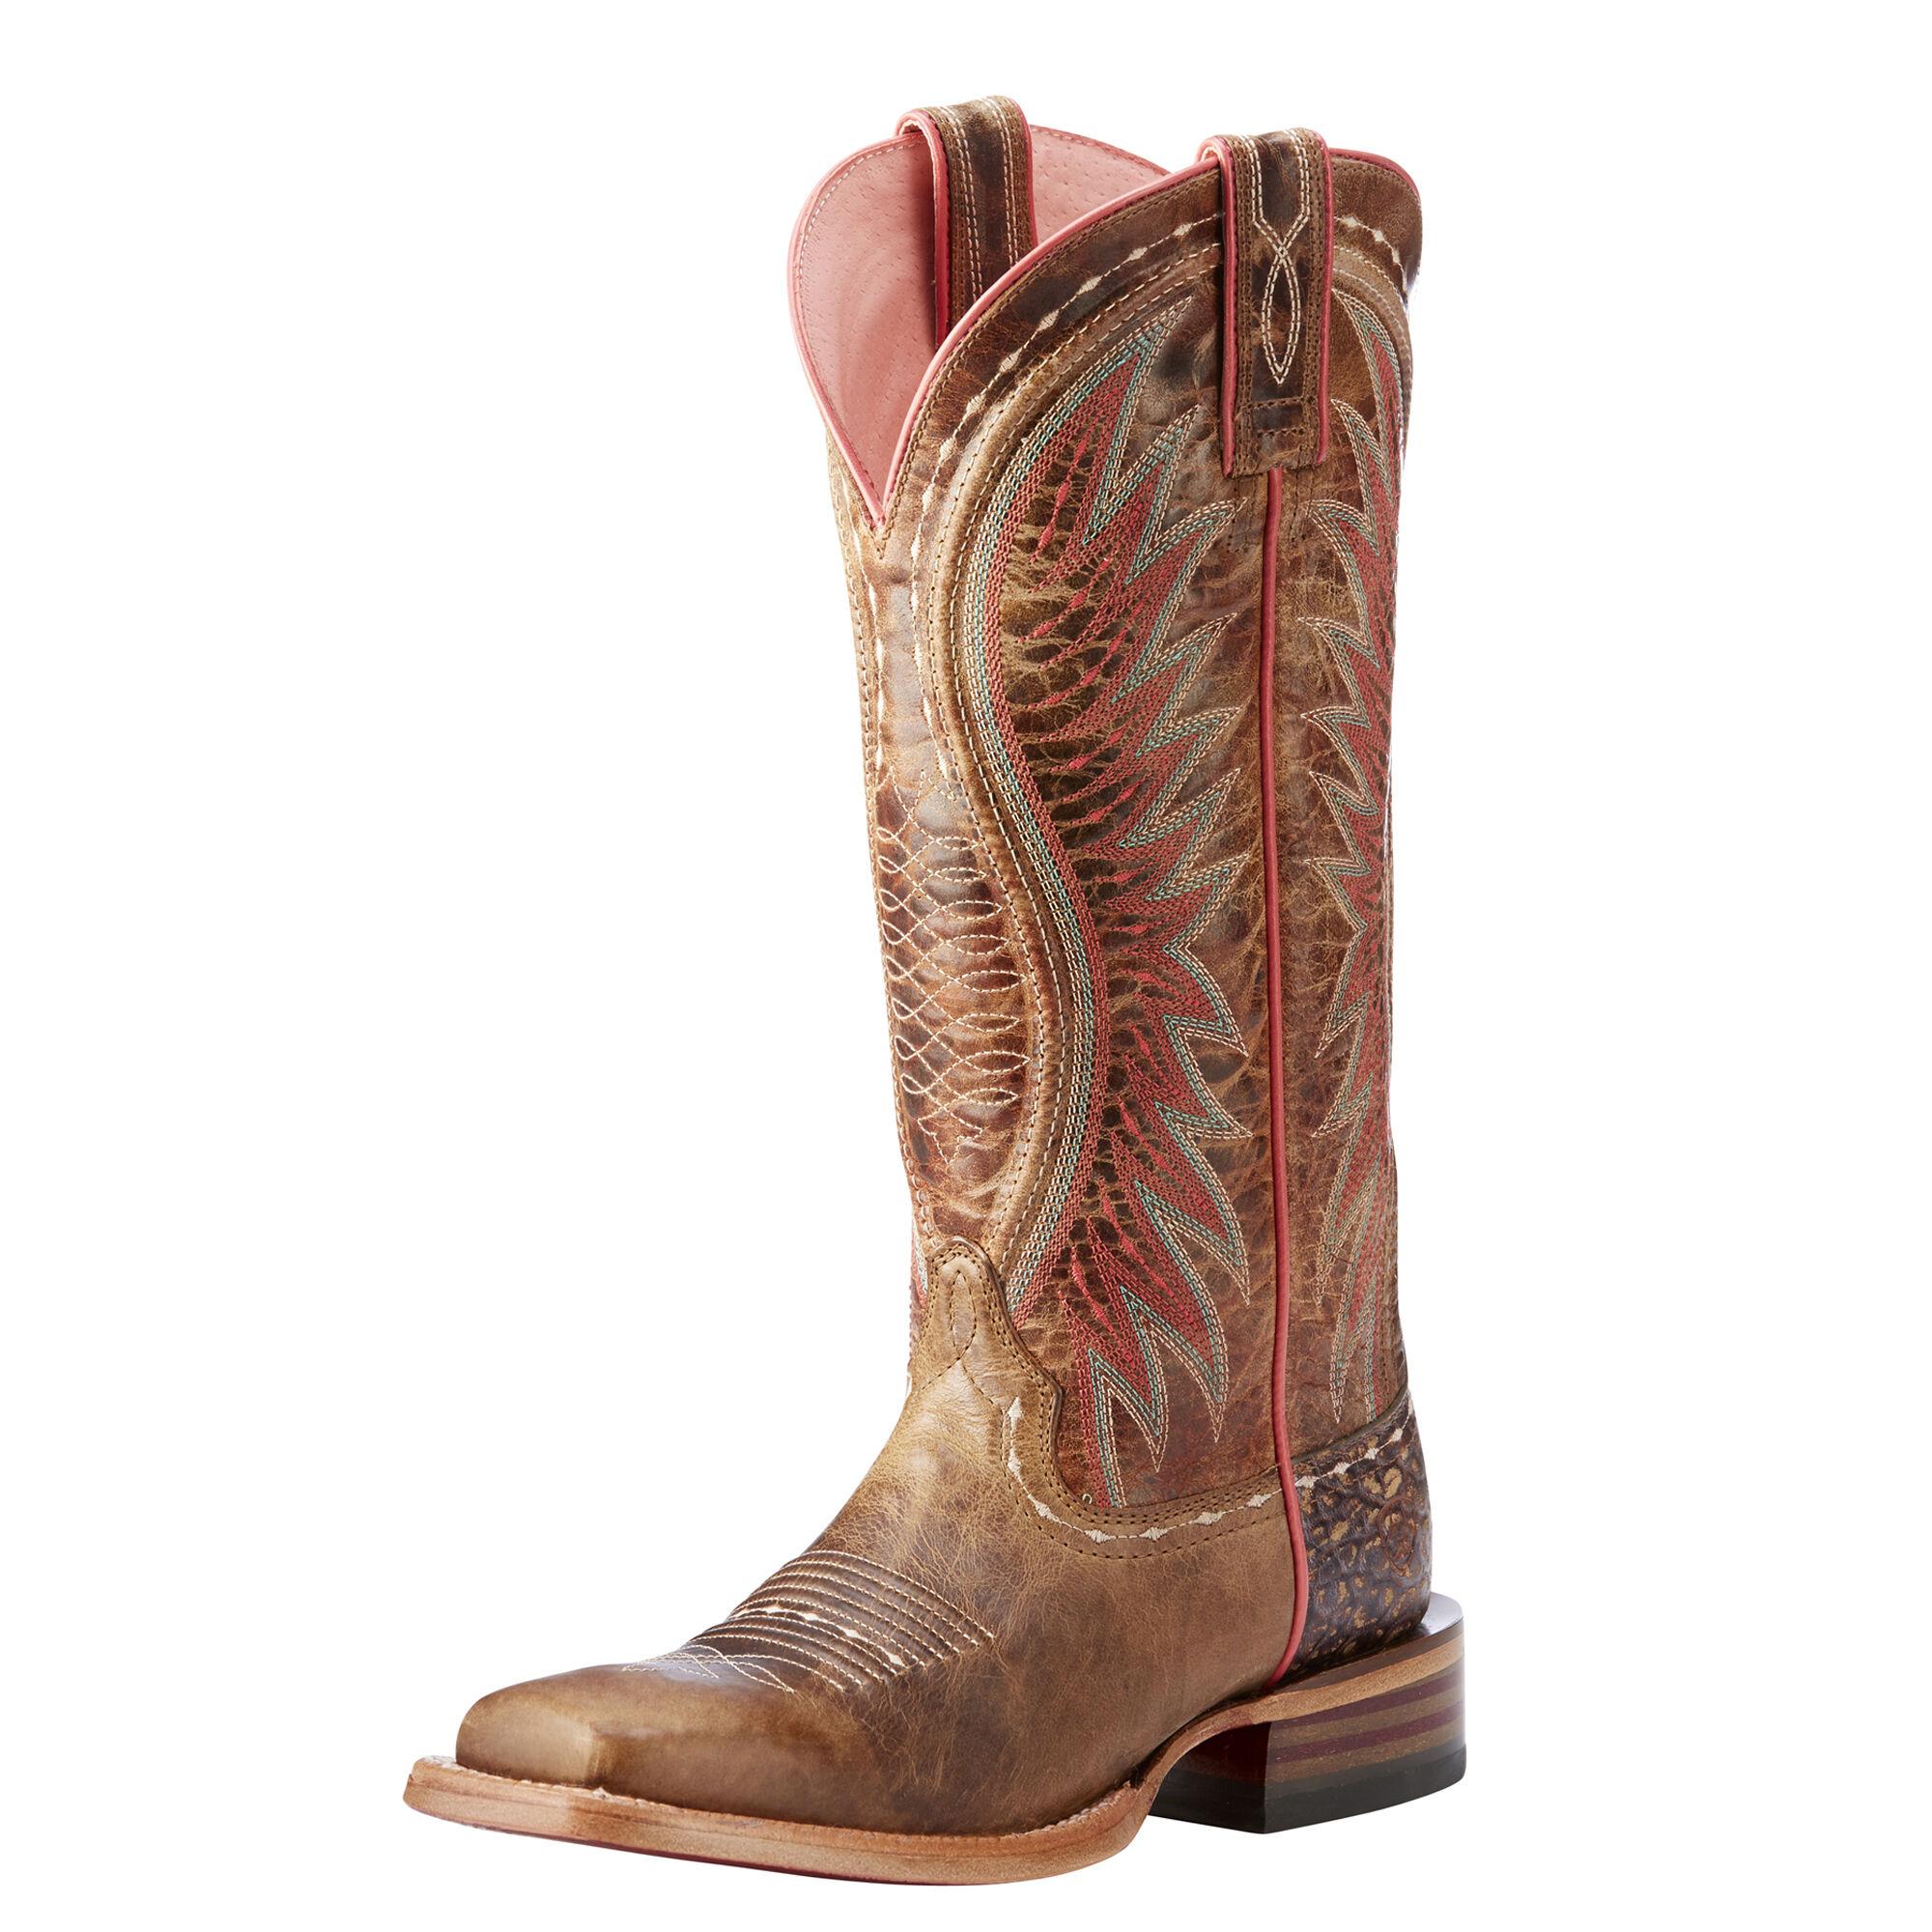 Vaquera Western Boot | Ariat